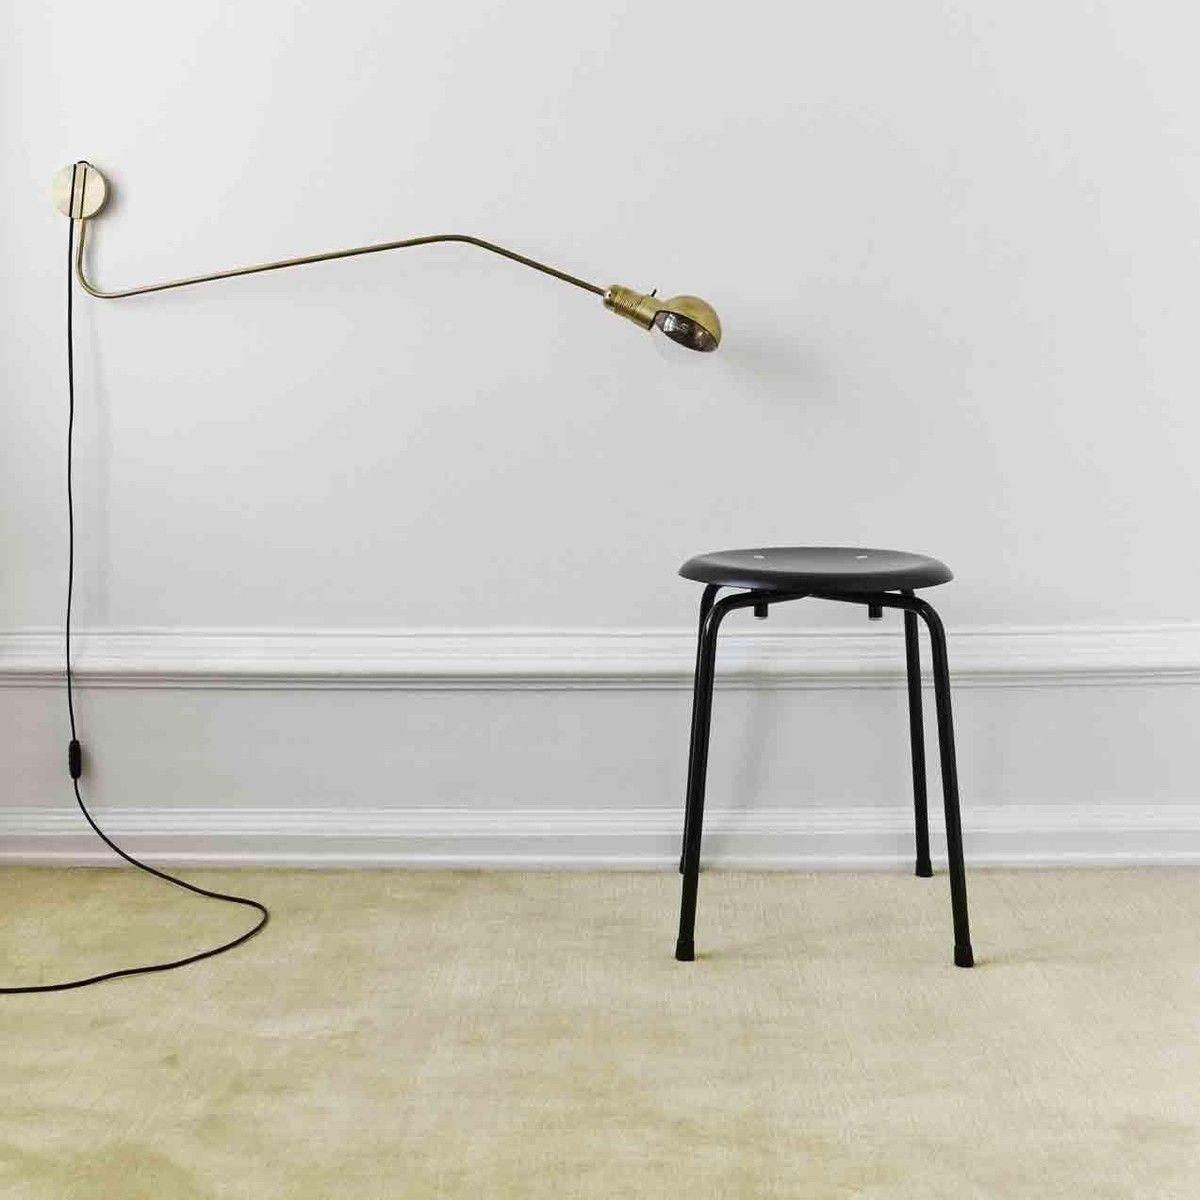 eiermann hocker s 38 s 1 wilde spieth egon eiermann. Black Bedroom Furniture Sets. Home Design Ideas